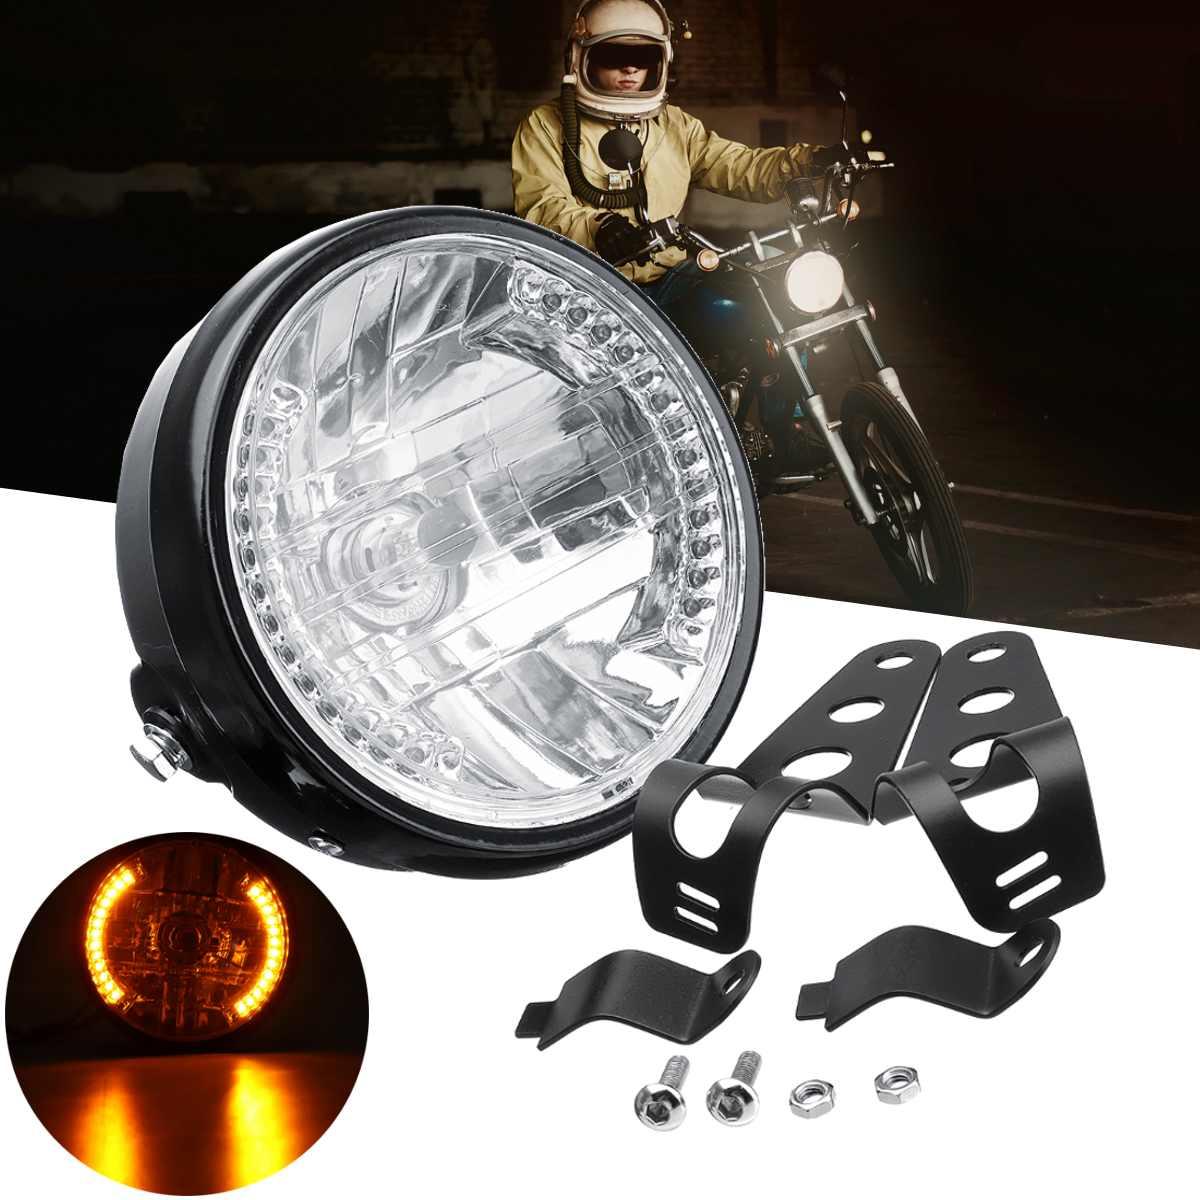 "7/"" Motorcycle Halogen Headlight H4 35W LED Projector Blinker Turn Signal Light"